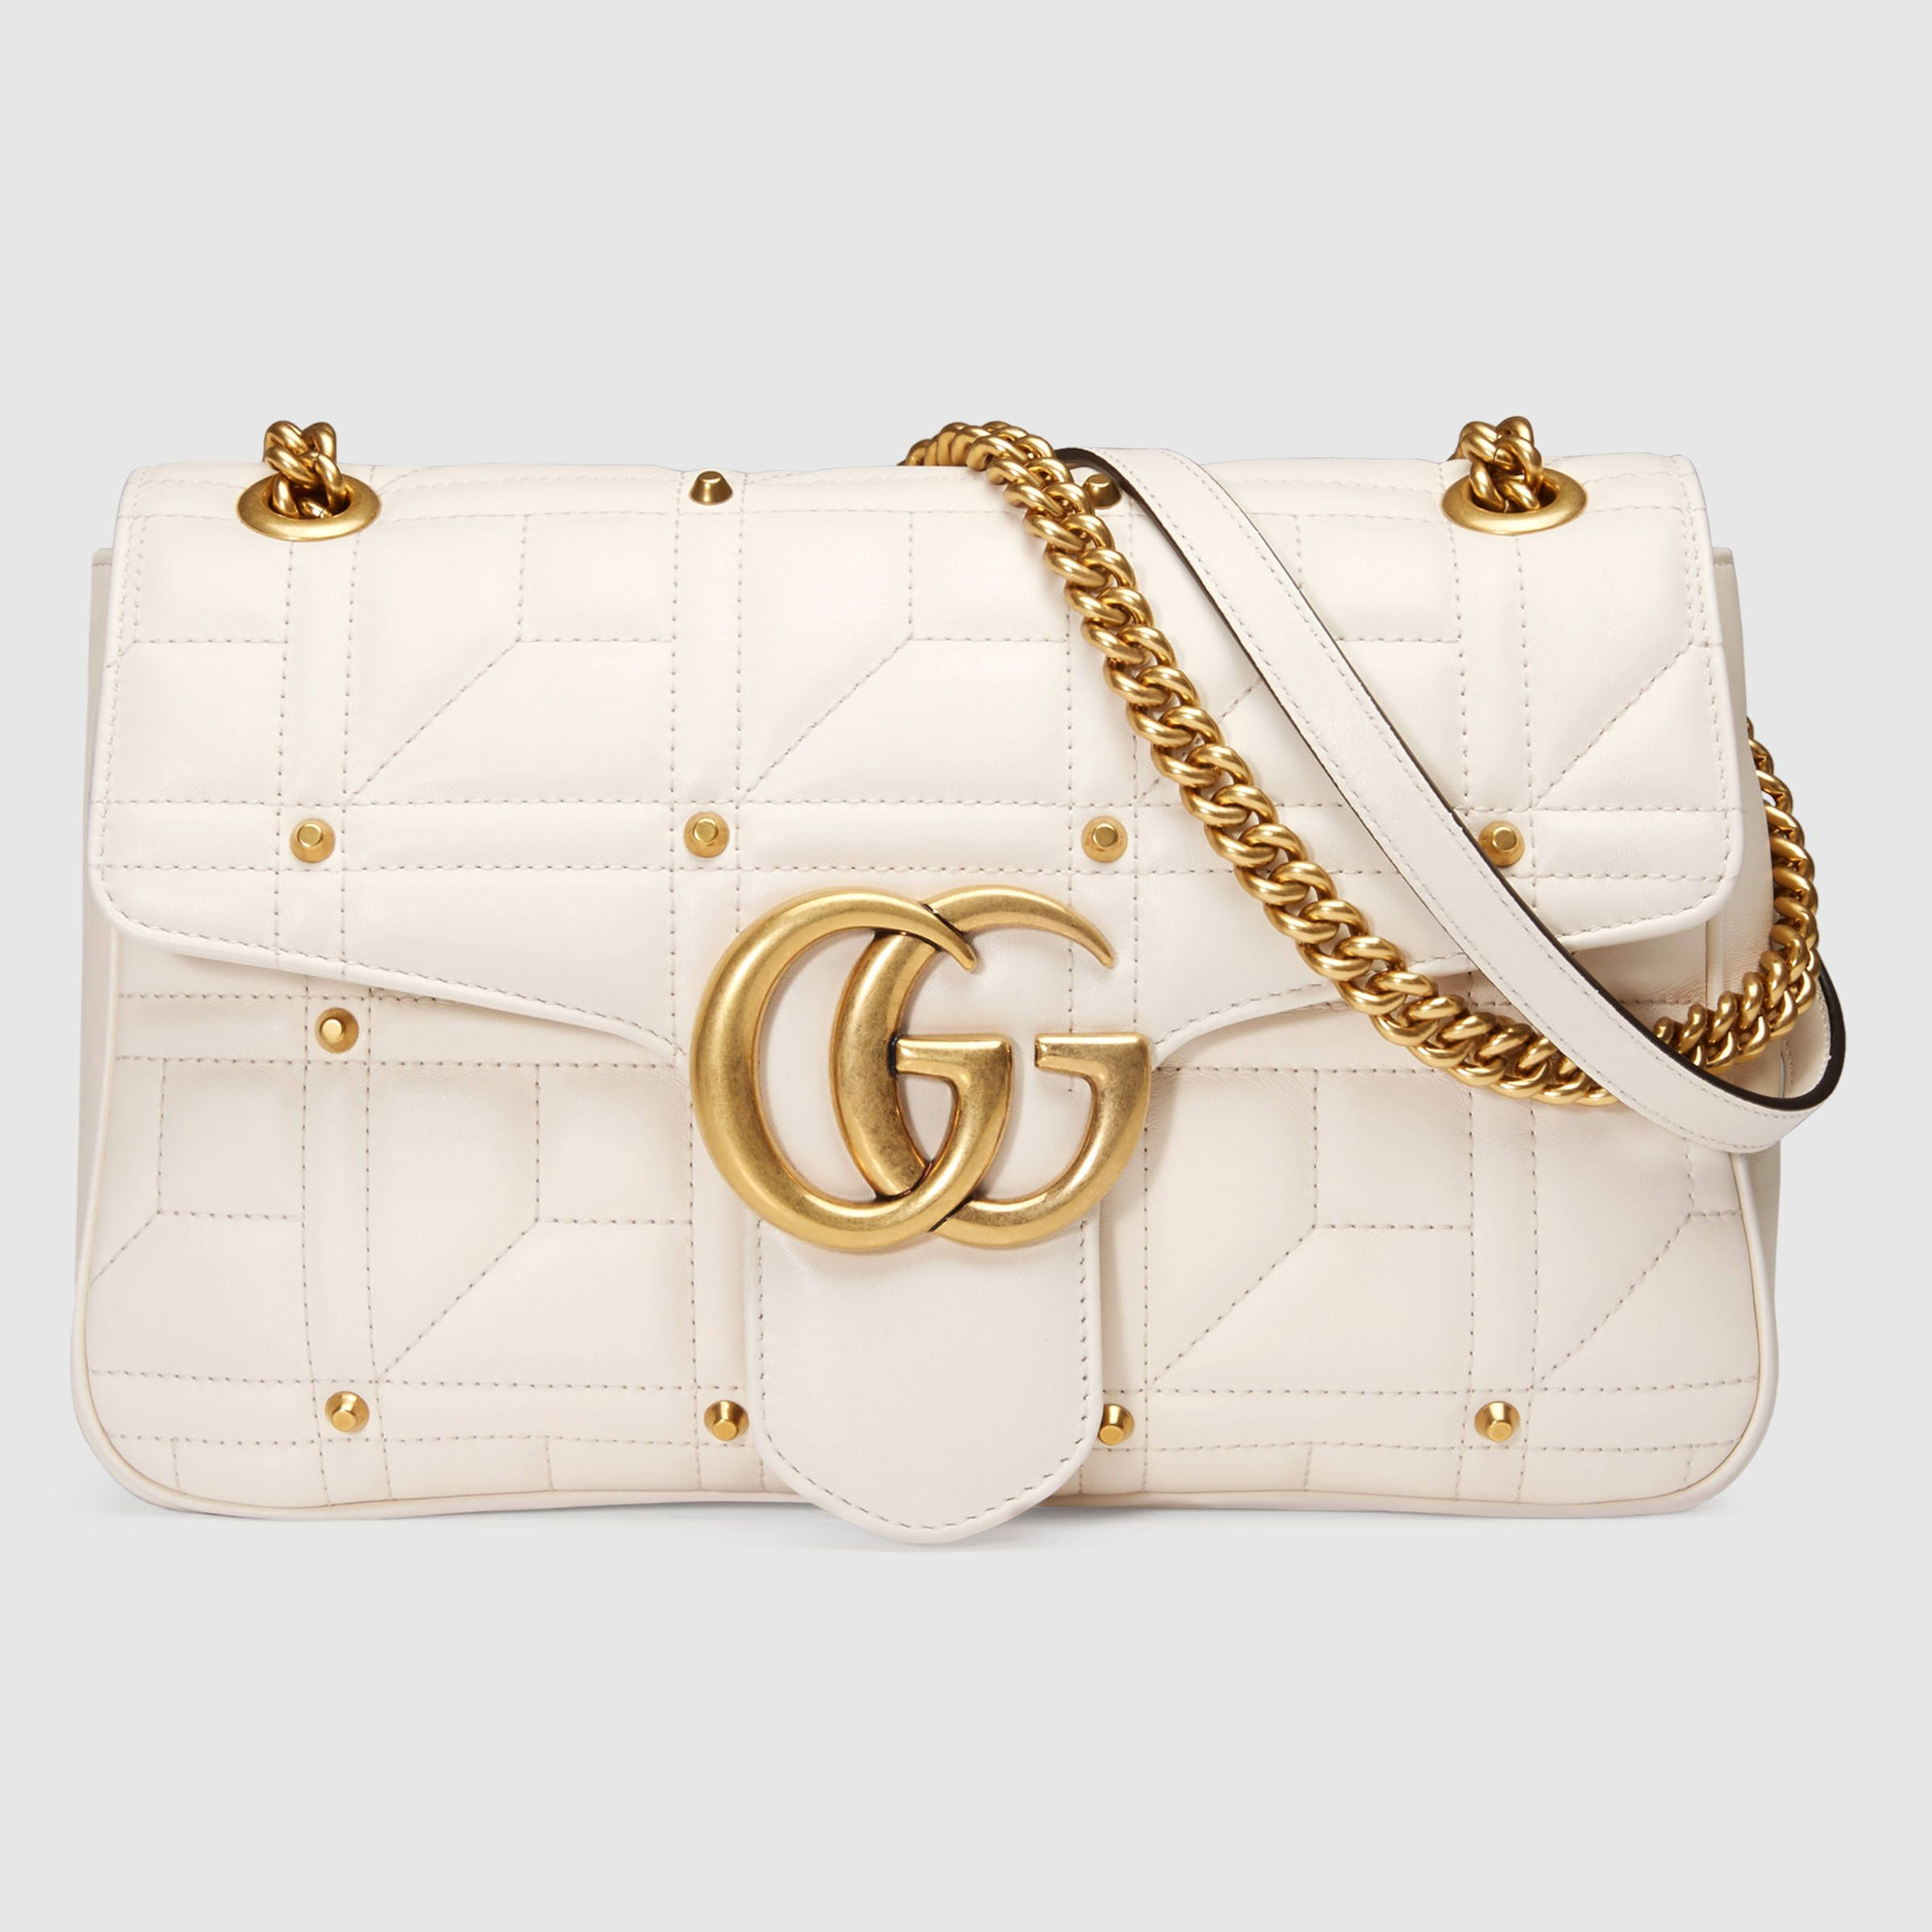 Gucci Women - GG Marmont matelassé shoulder bag - 443496DRWAT9022 ... 28fd07b95ae54